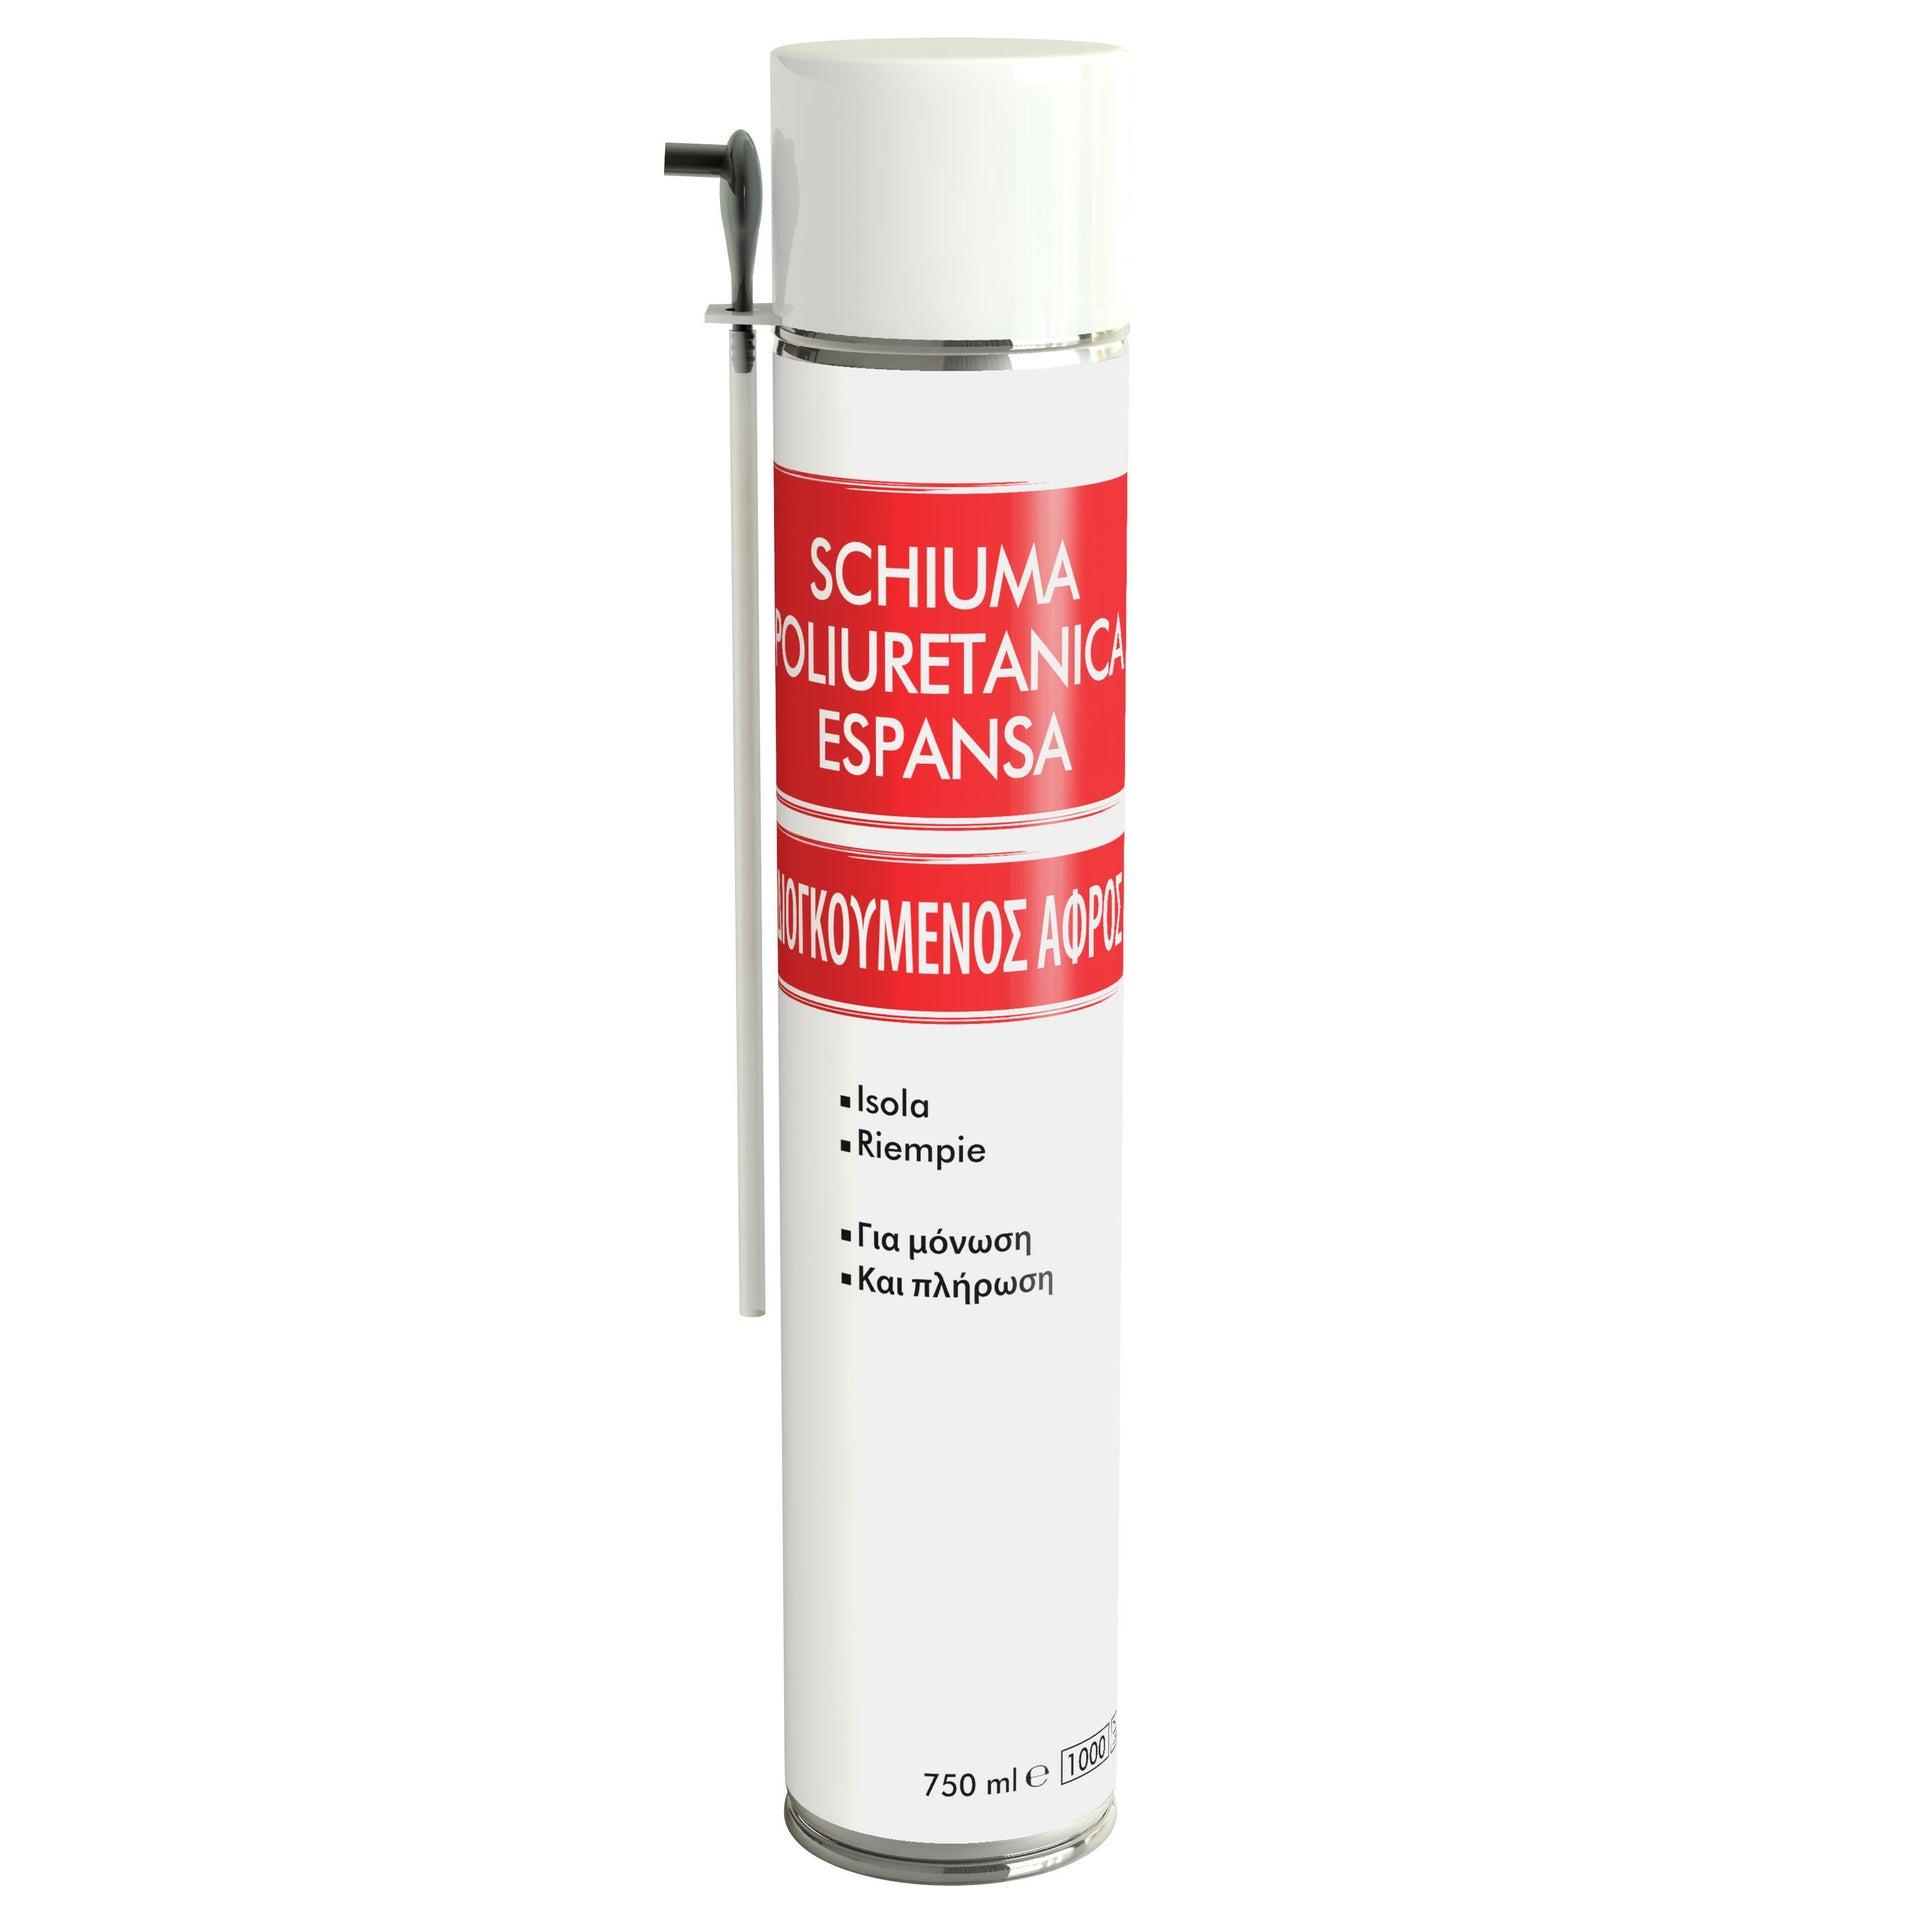 Schiuma espansa poliuretanica bianco per porta 0,75 ml - 2